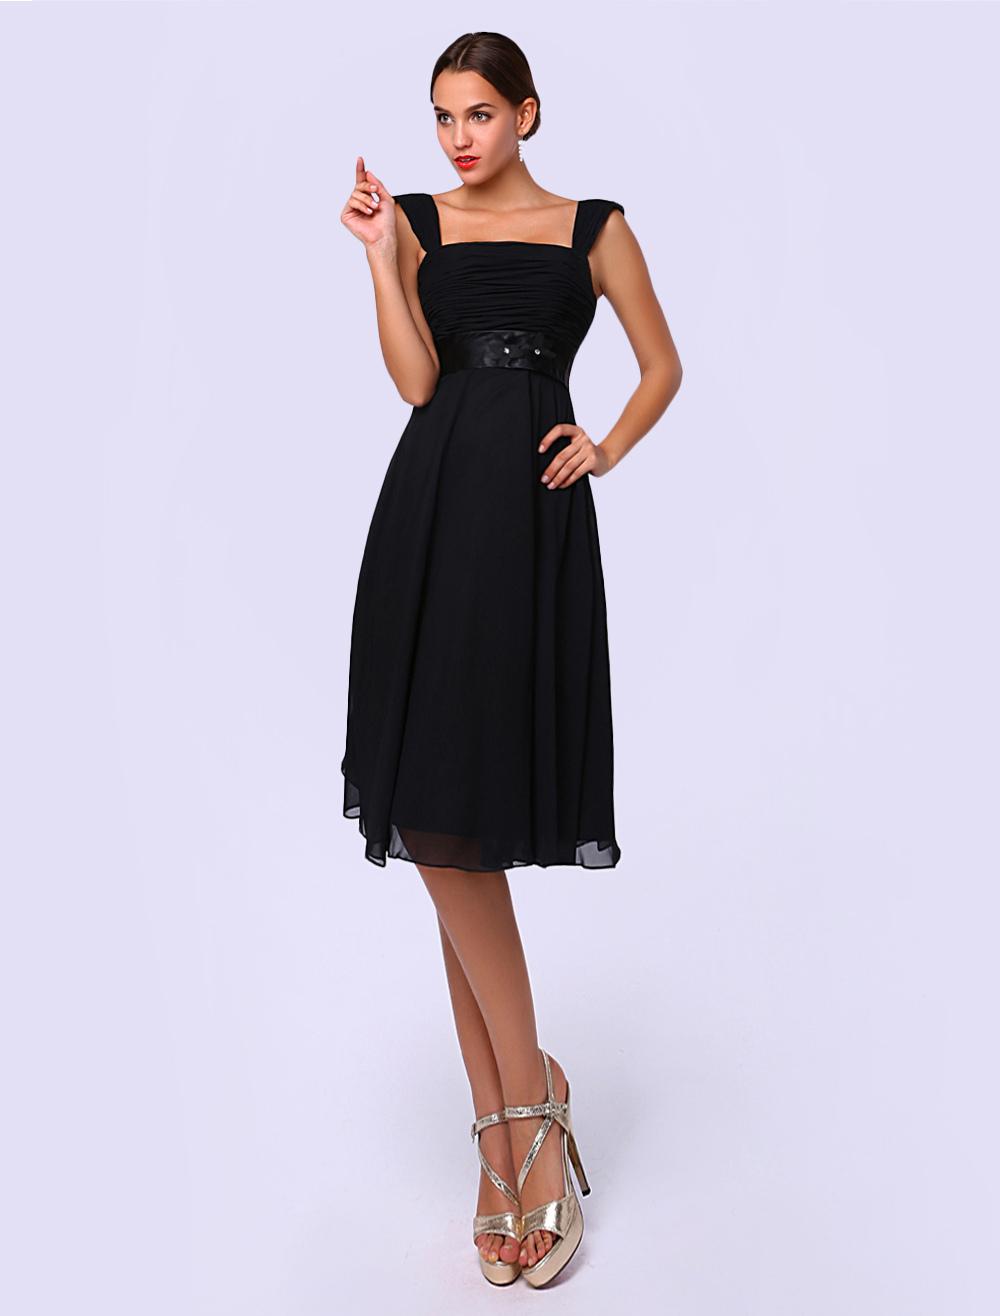 Black A-line Tea-Length Cocktail Dress with Square Neck Sash Chiffon